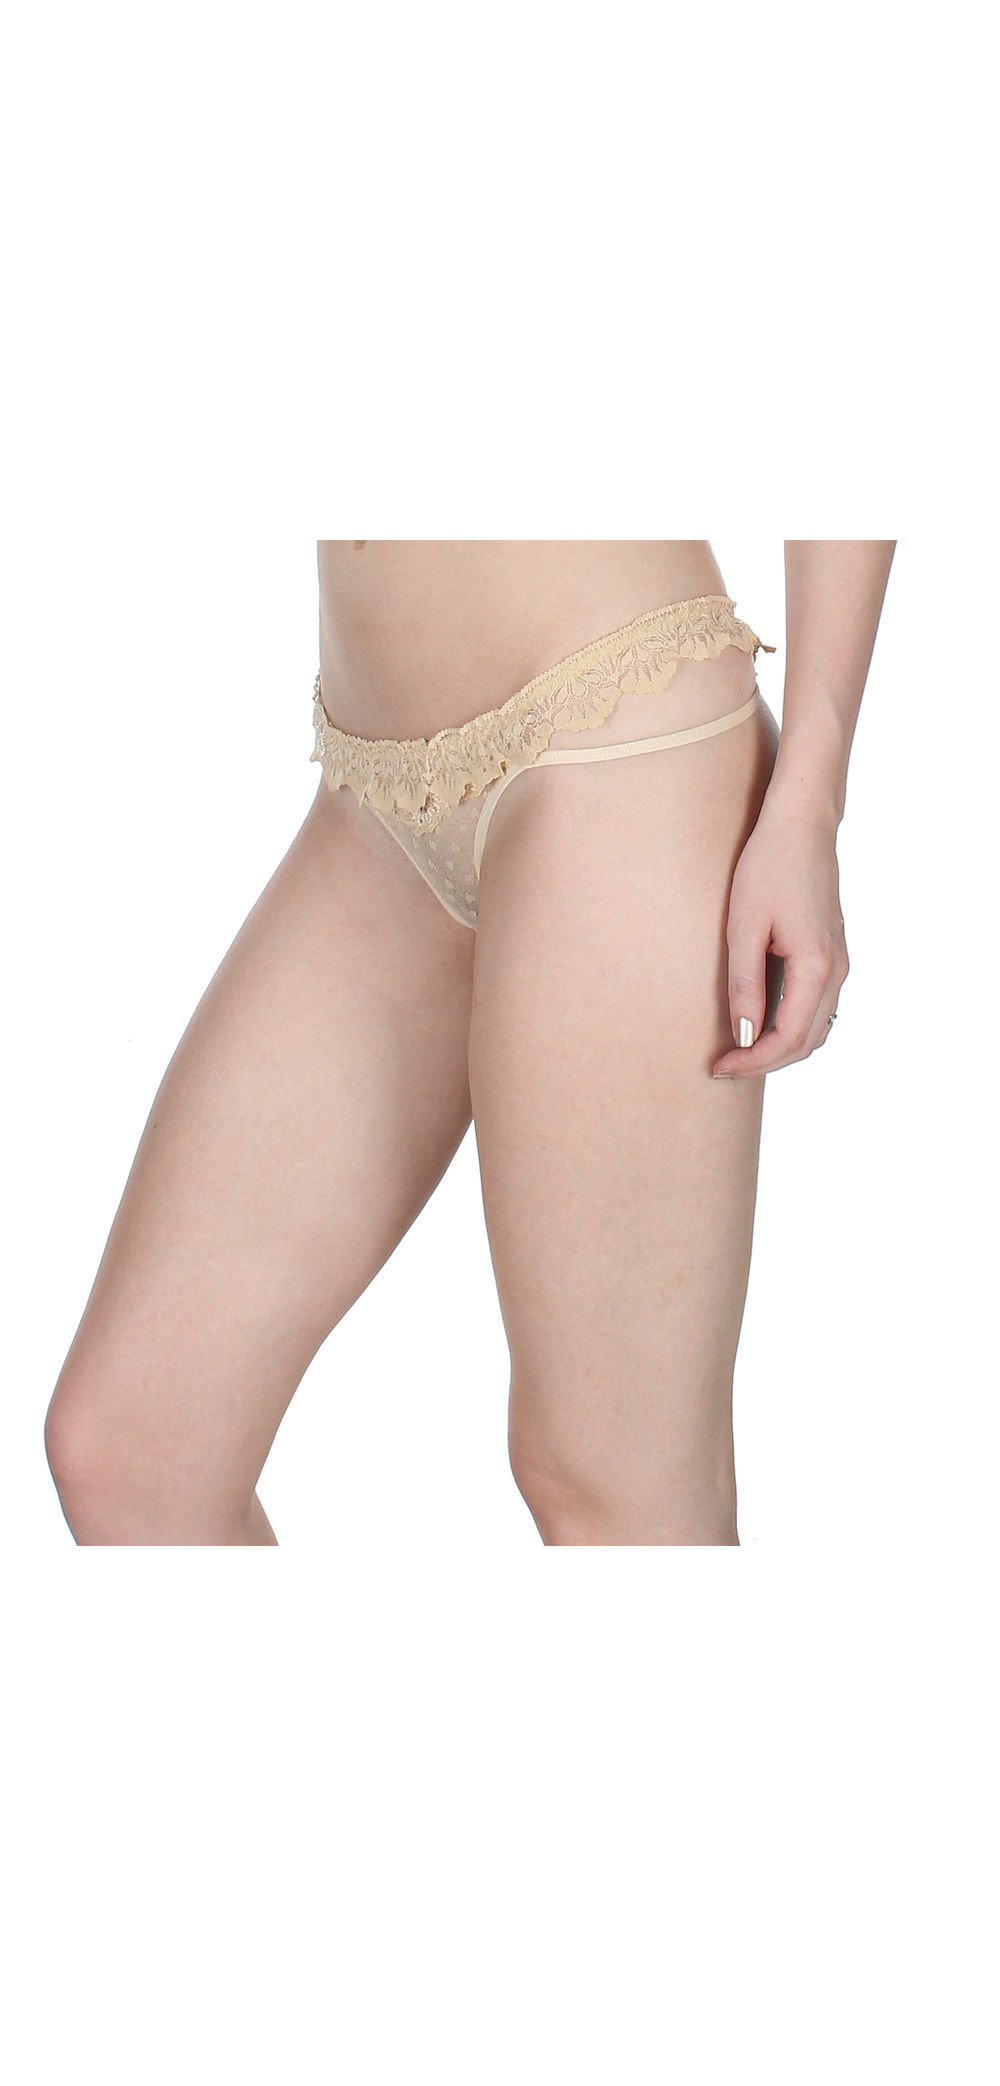 amazing-self-pics-thongs-pics-nude-evans-nude